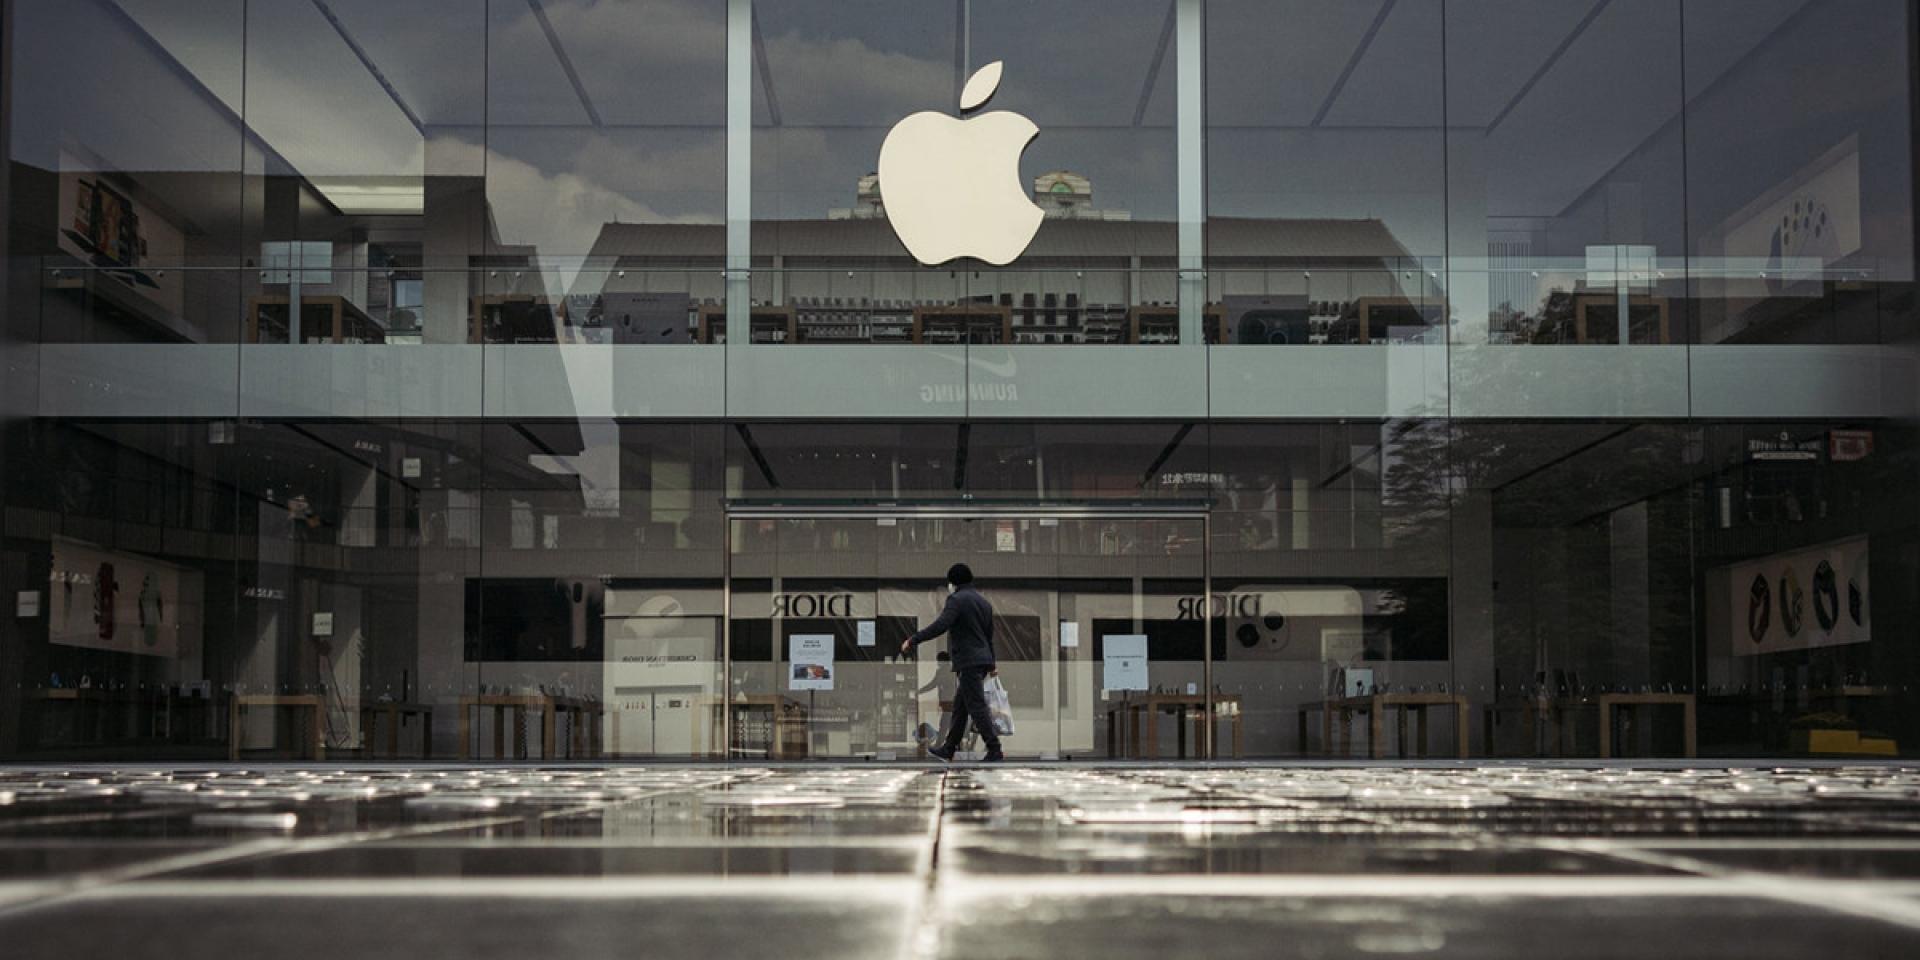 iPad、AirPods將變MIT!? Apple受武漢肺炎衝擊,部分產品轉單台灣